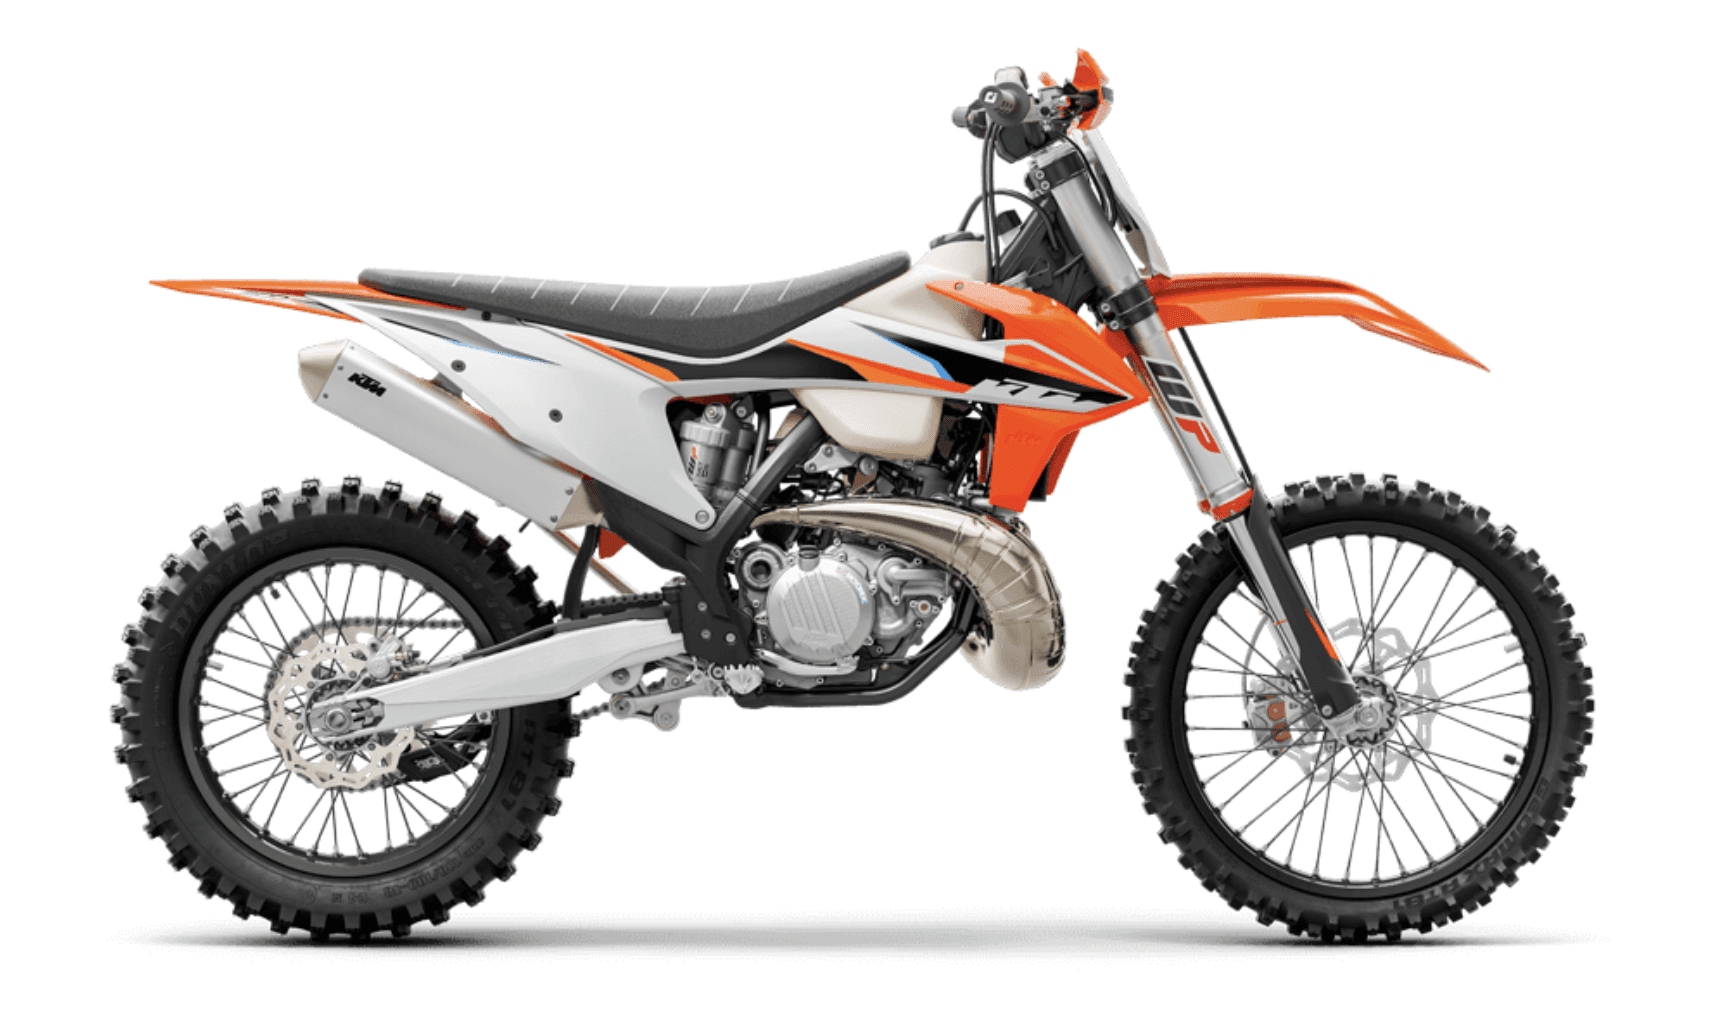 2021 KTM Cross country dirt bikes